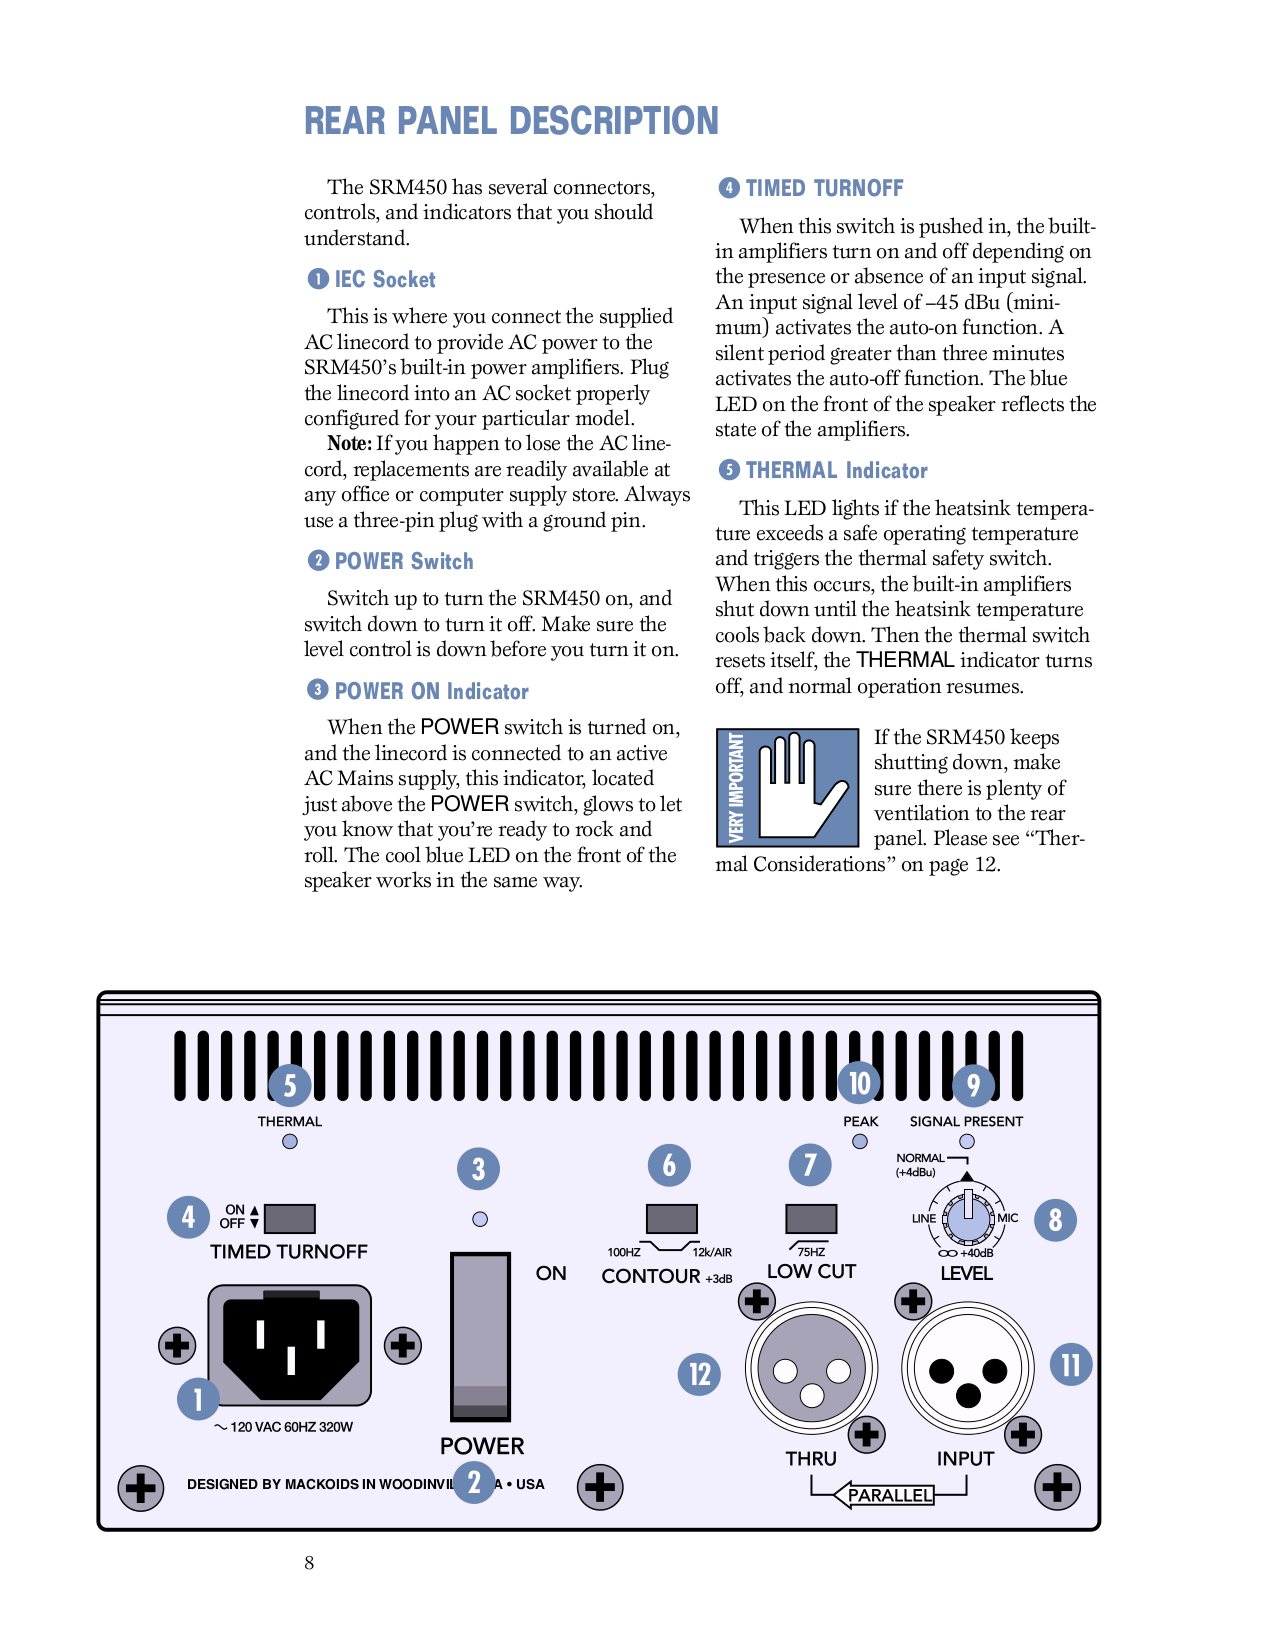 pdf manual for mackie speaker system srm450 rh umlib com mackie srm450 review mackie srm450 review